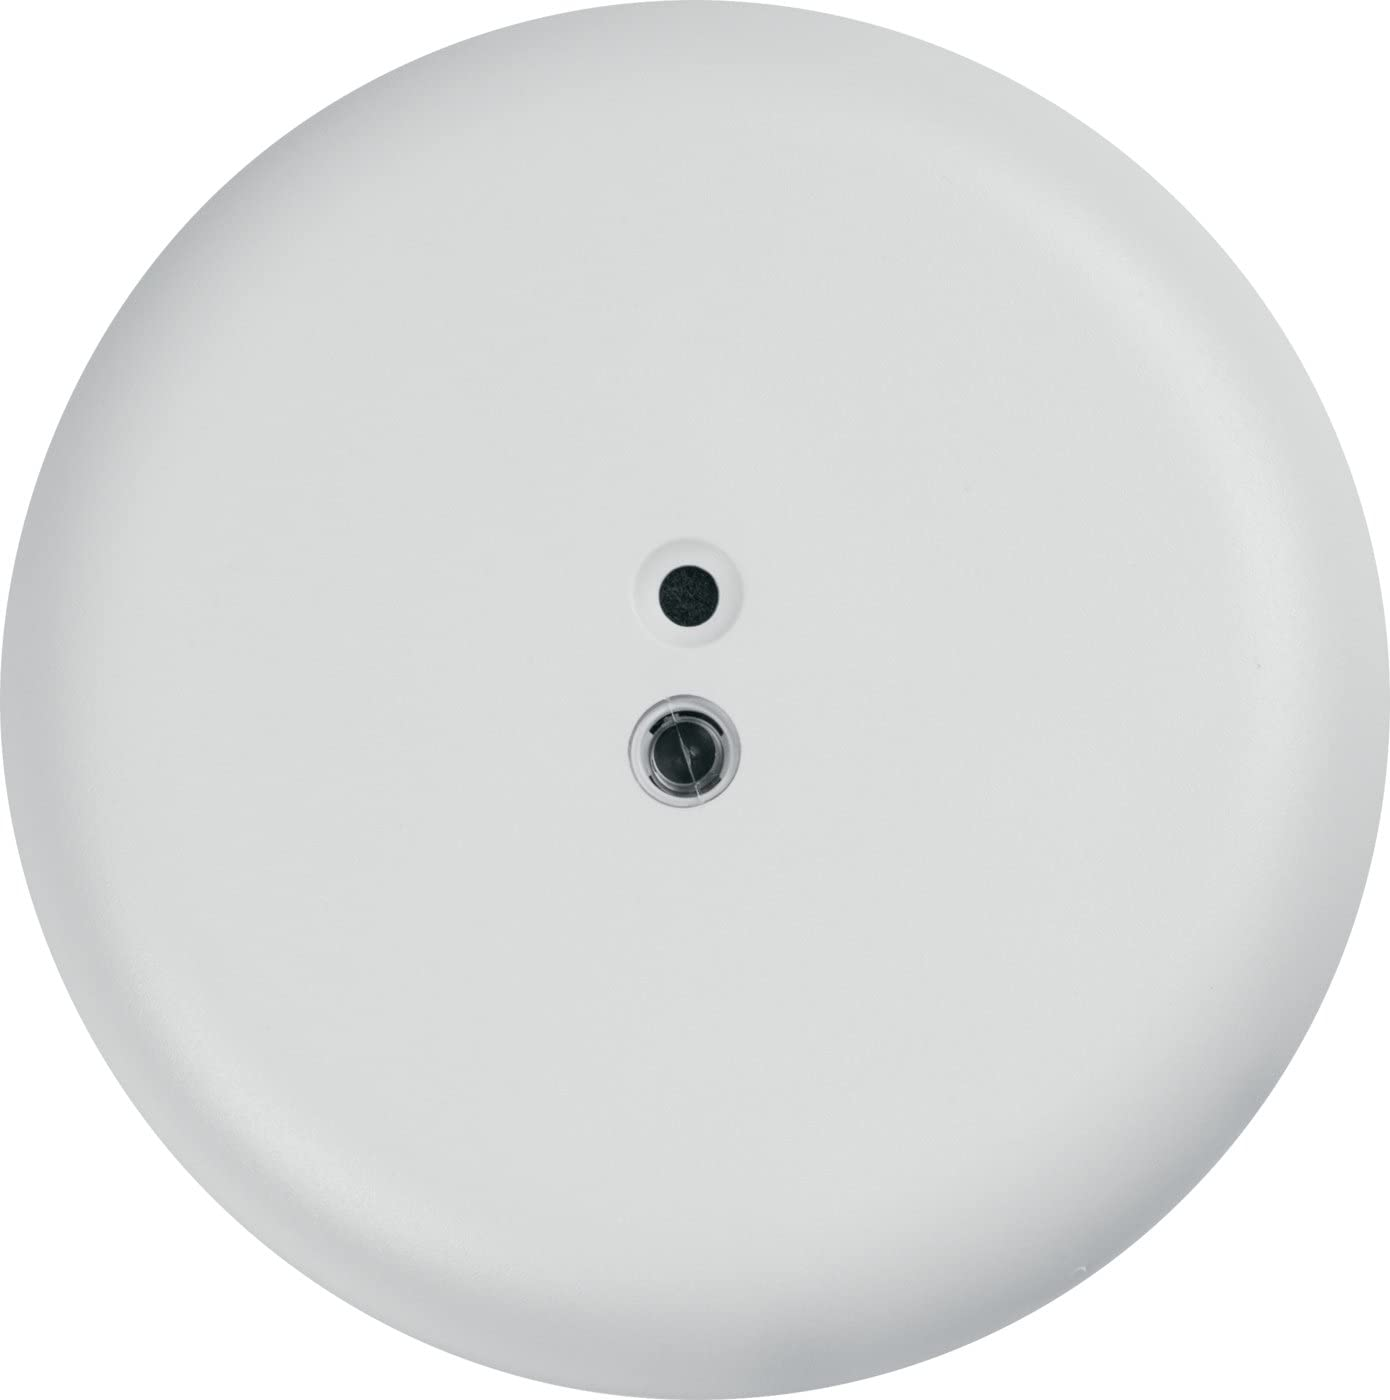 Interlogix Acoustic Glassbreak Detector, Round (5812-RND)